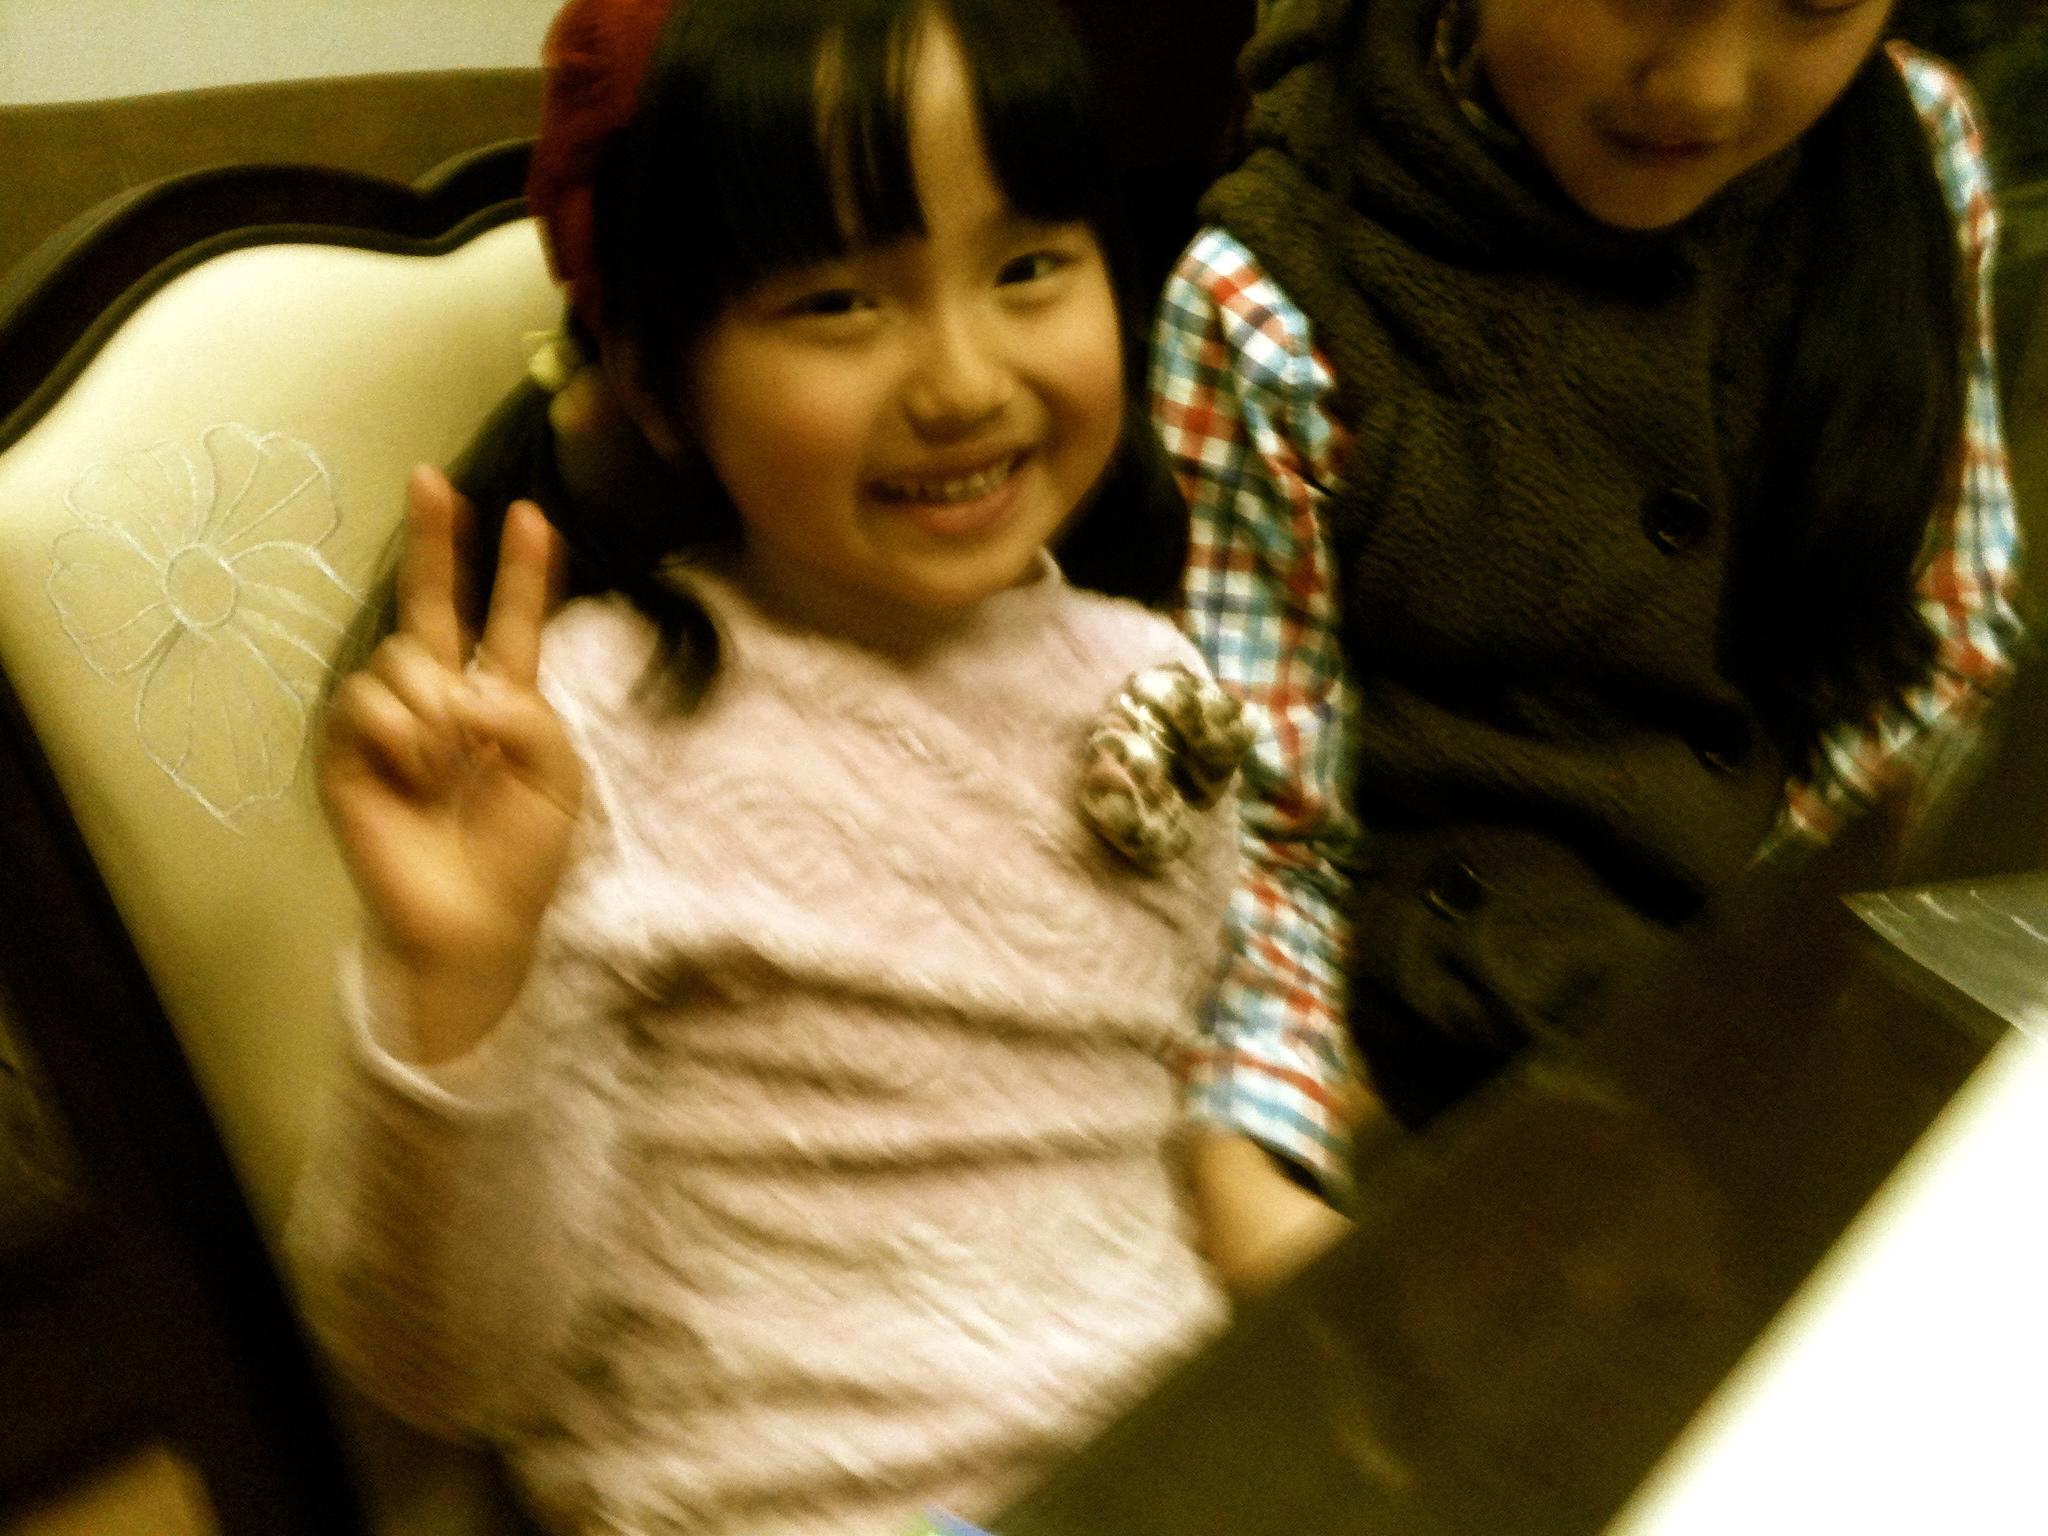 My Korean student